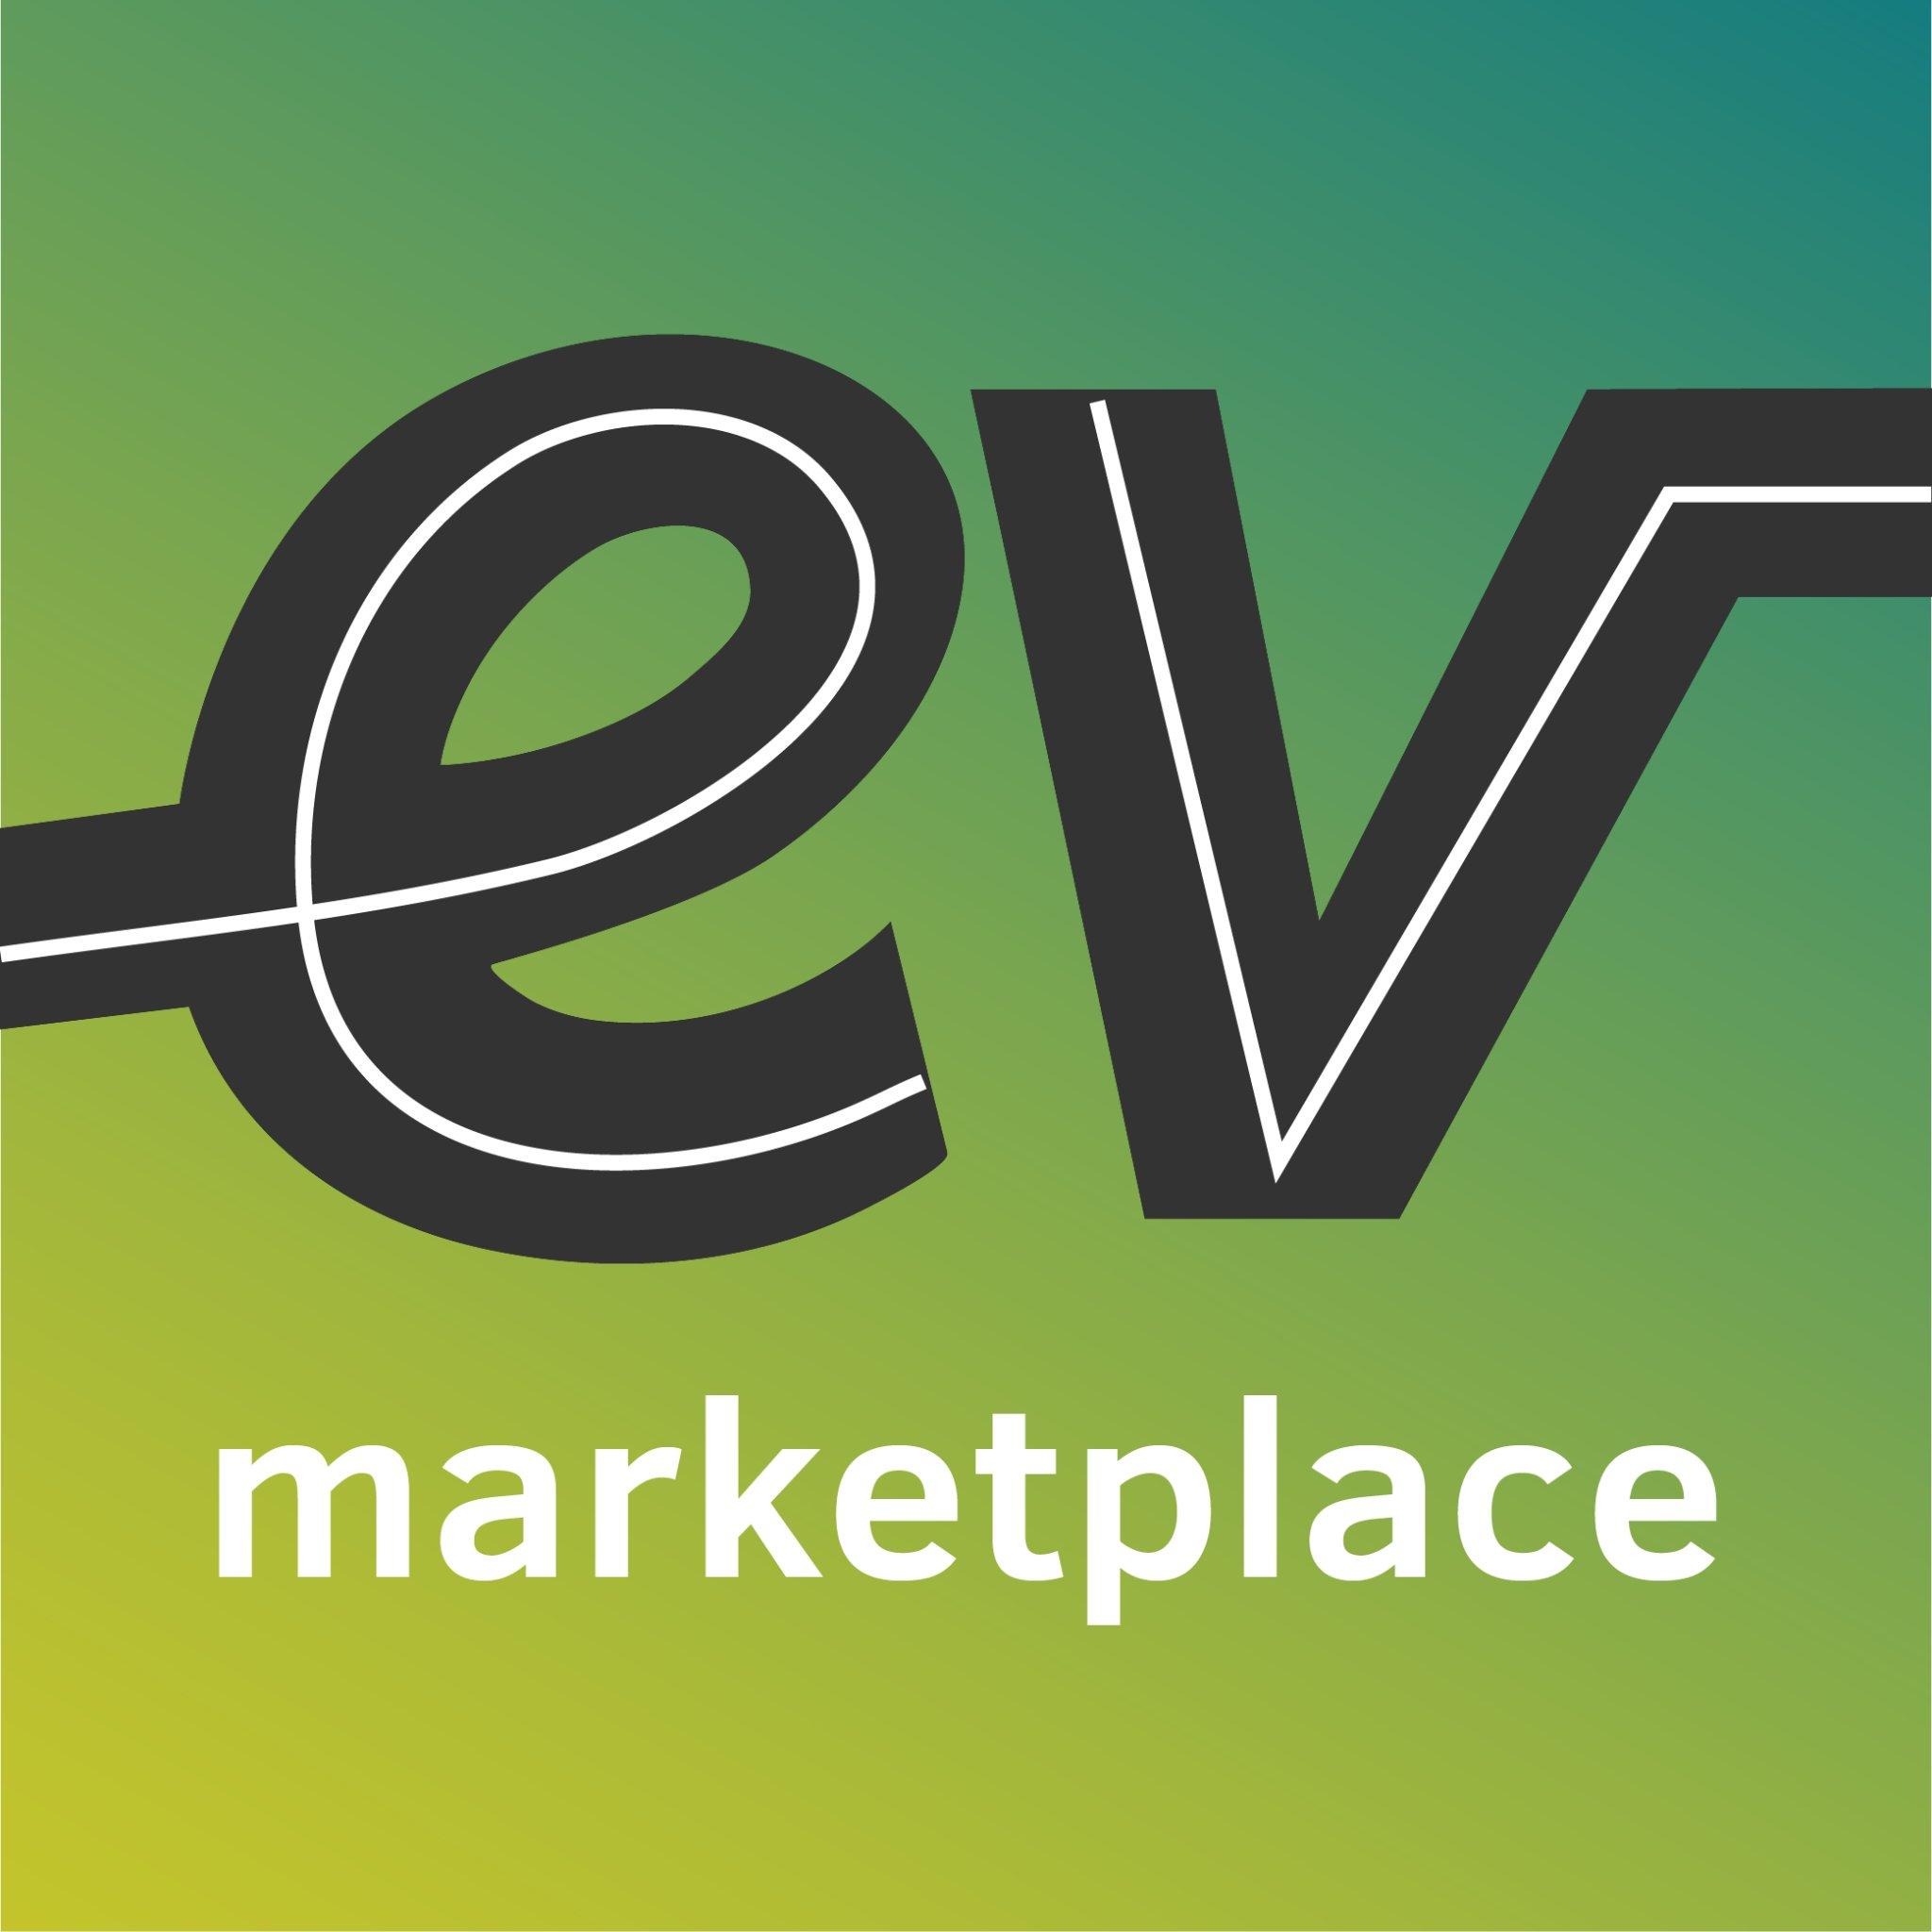 EVmarketplace